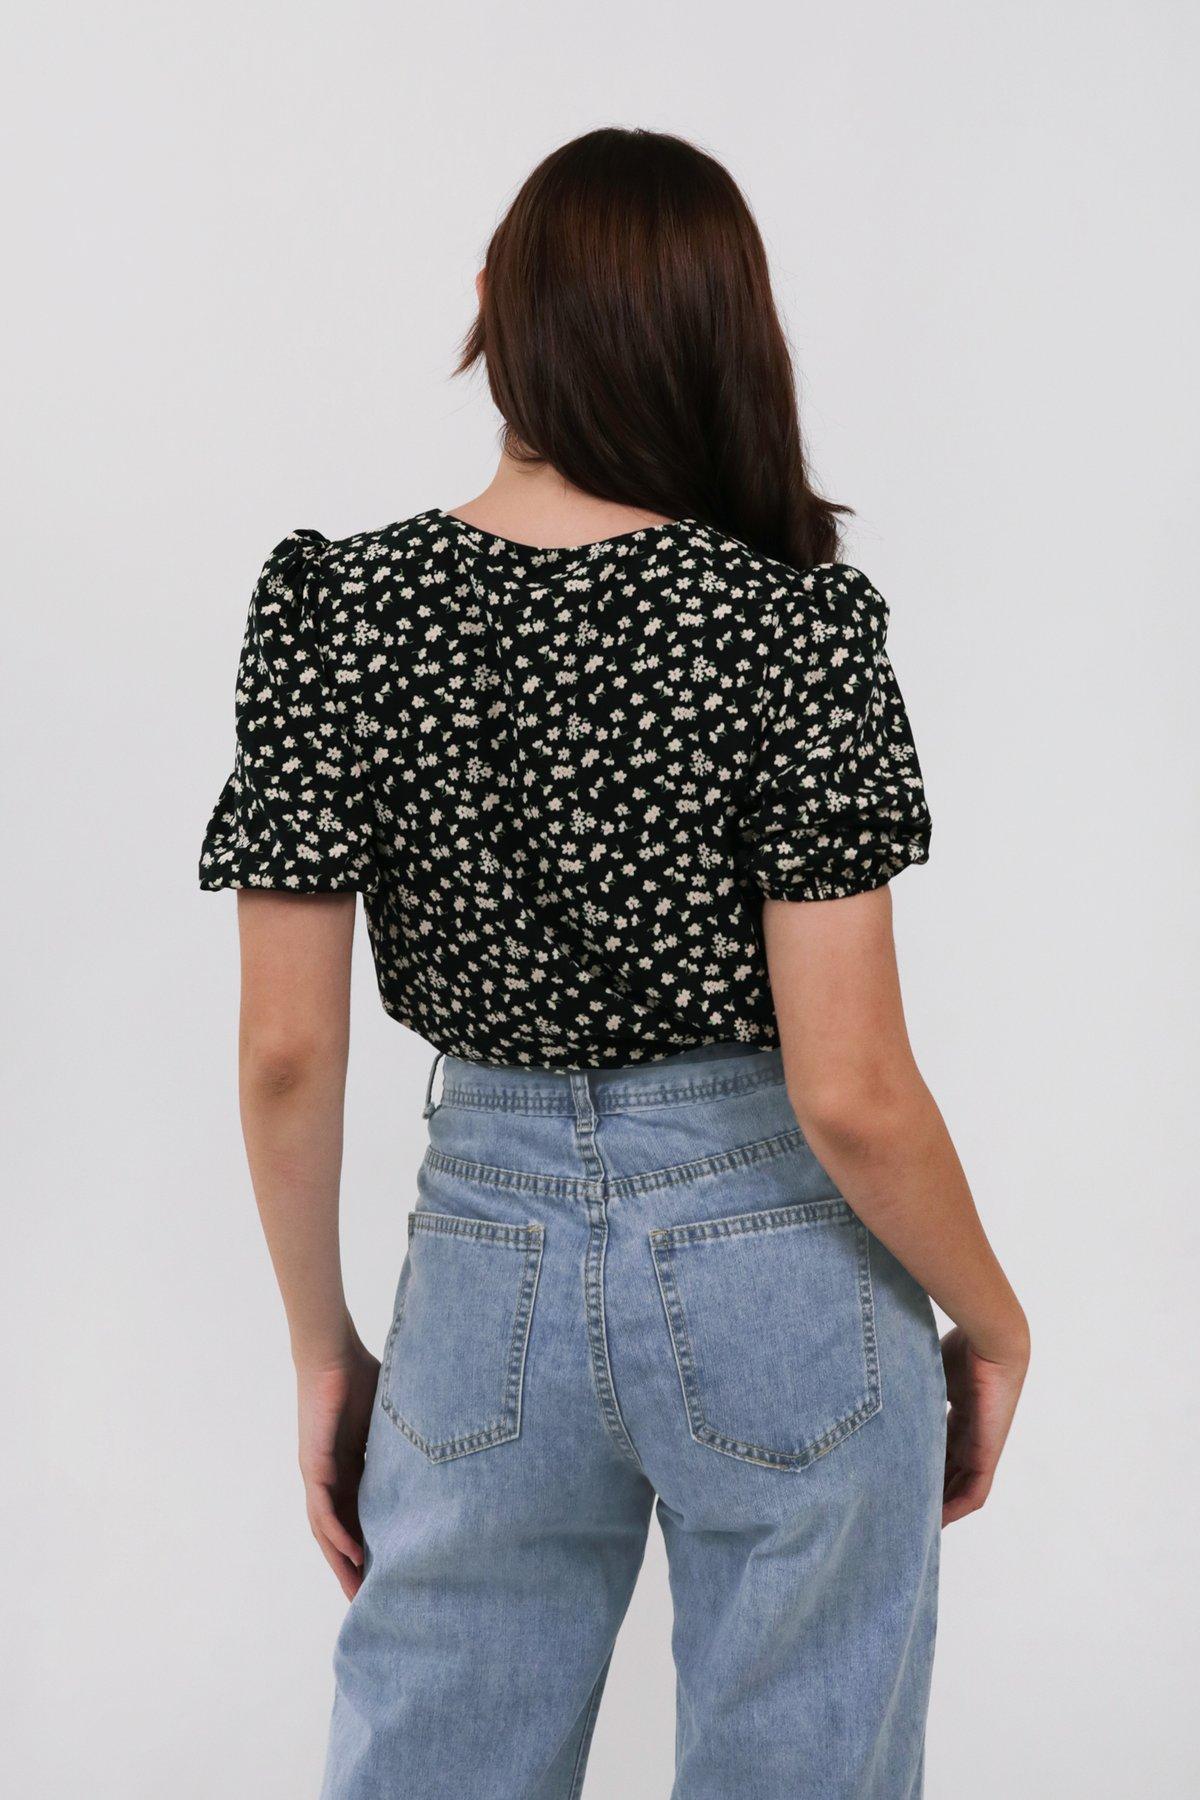 Elora Puffy Sleeved Top (Black Daisy)